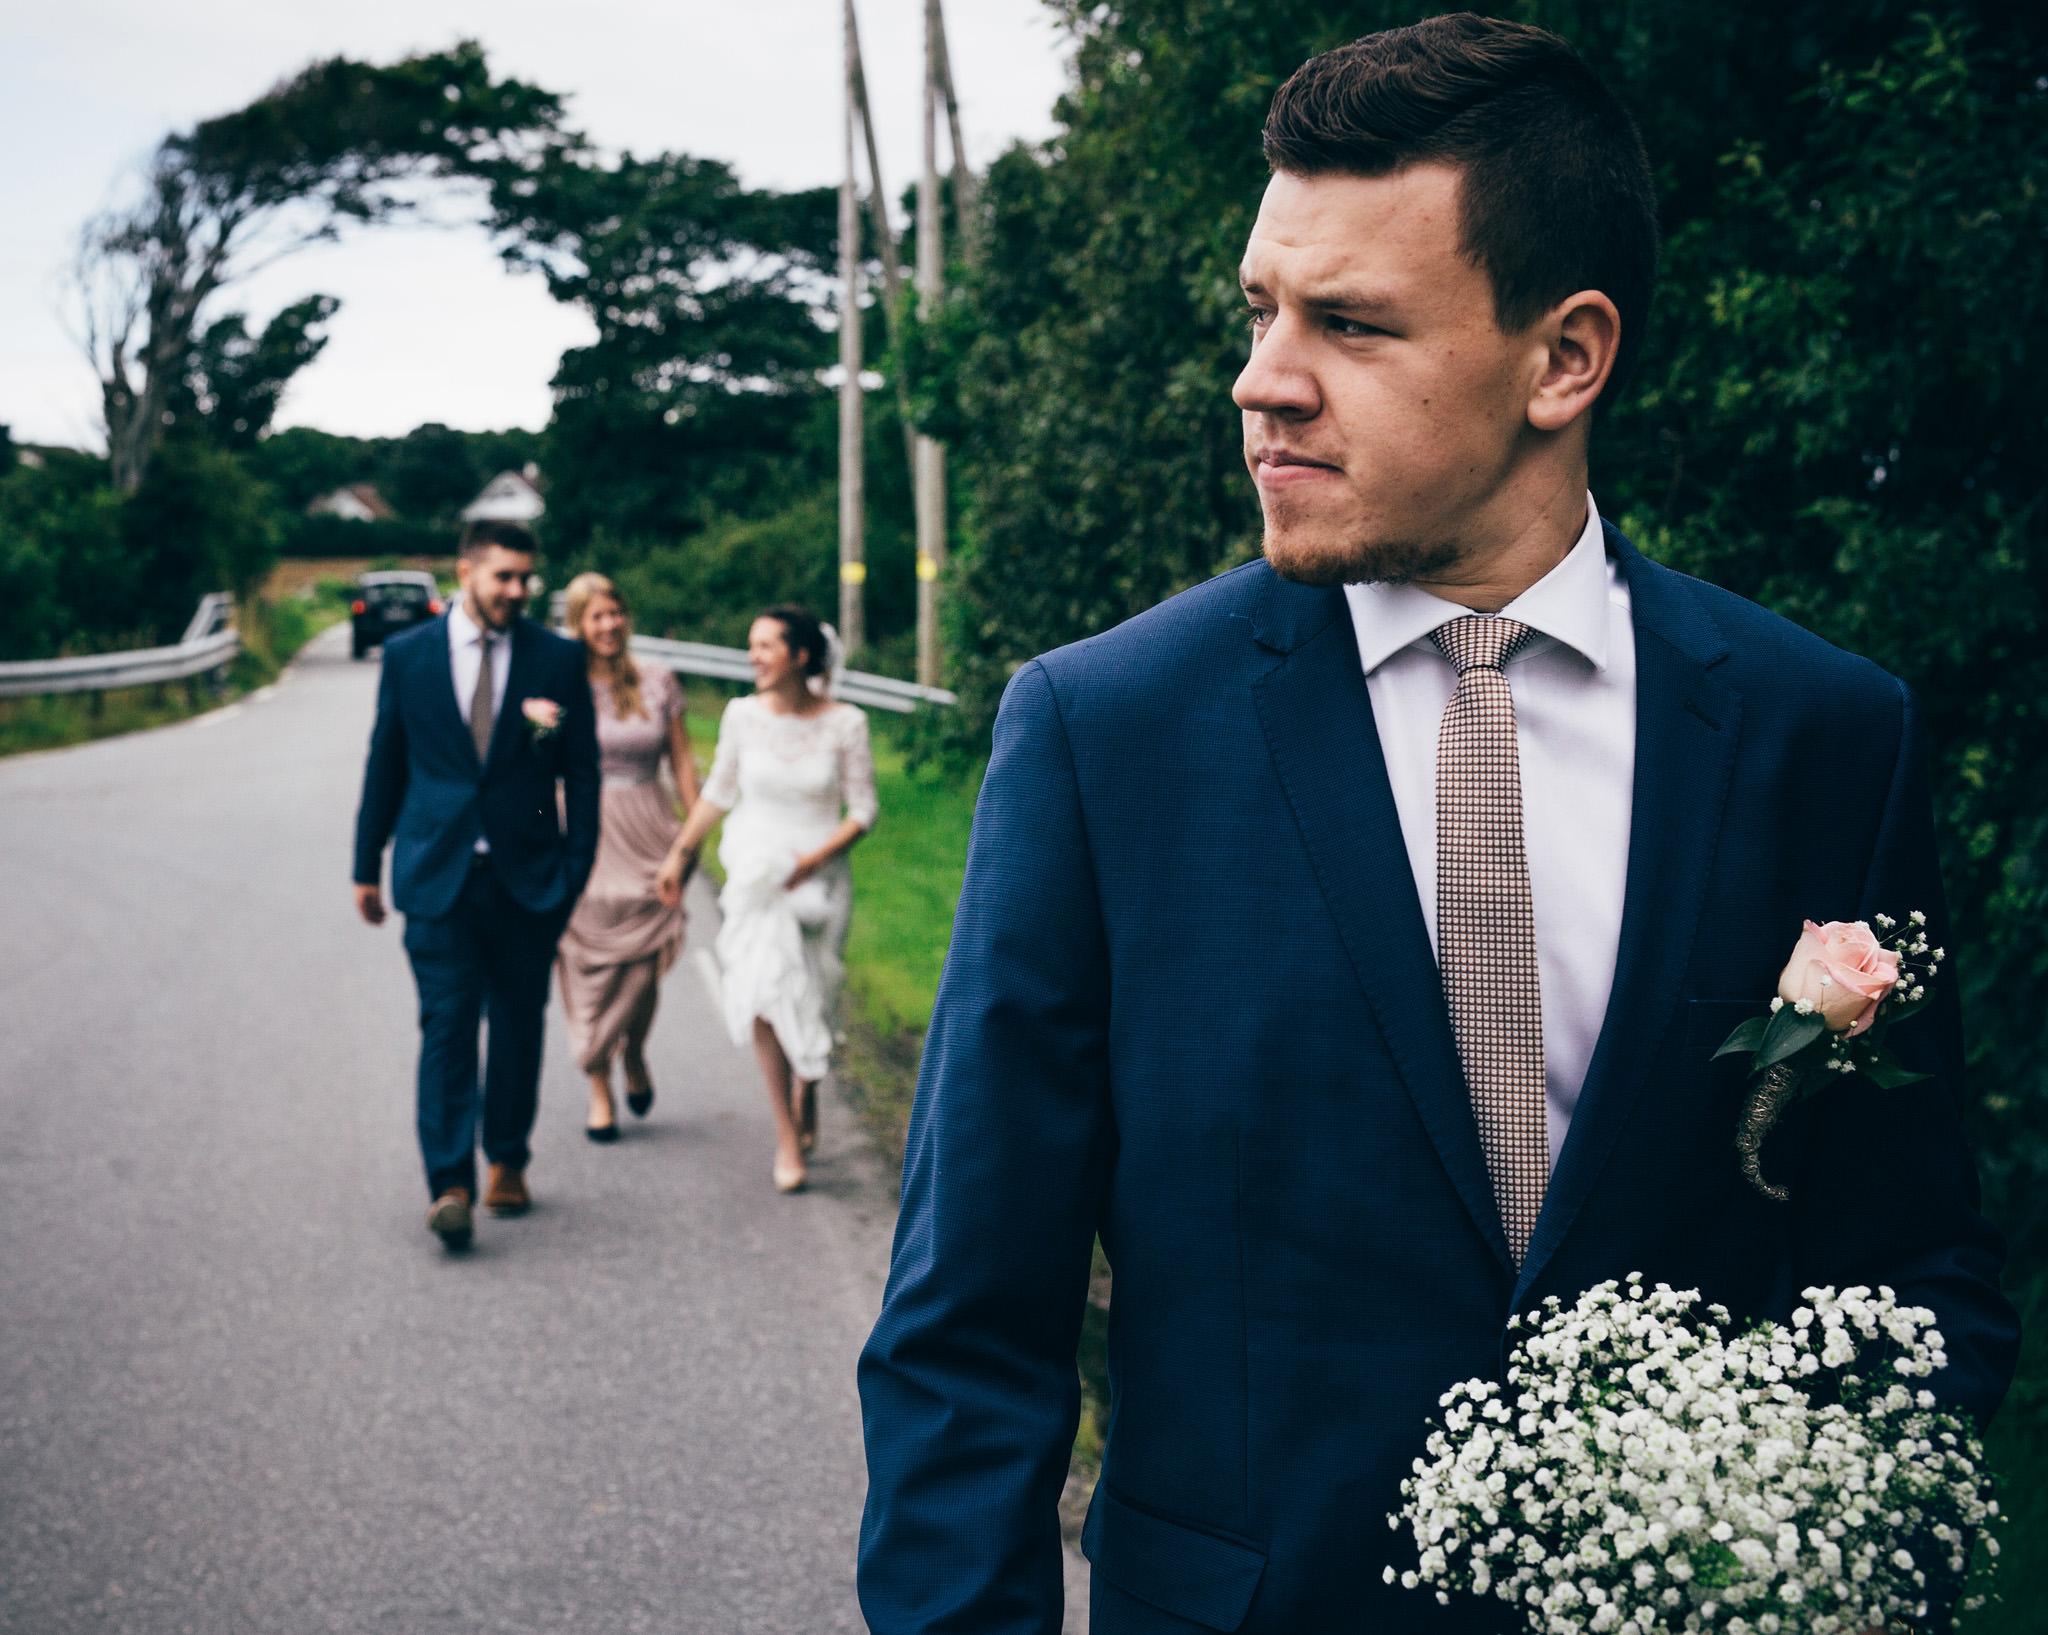 Norway+wedding+photographer+elopement+pre+wedding+Casey+Arneson-75.jpg